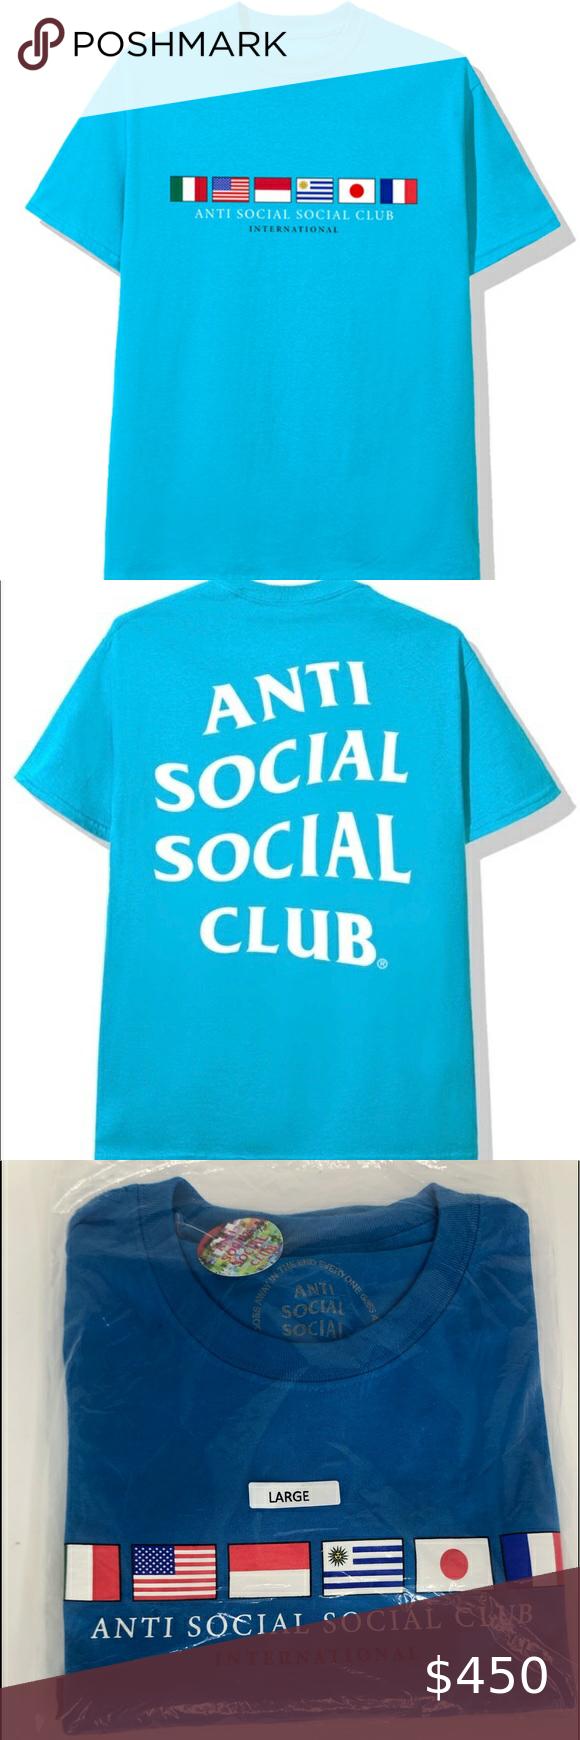 New Anti Social Social Club Members Only Tee Sz L Anti Social Social Club Anti Social Social Club